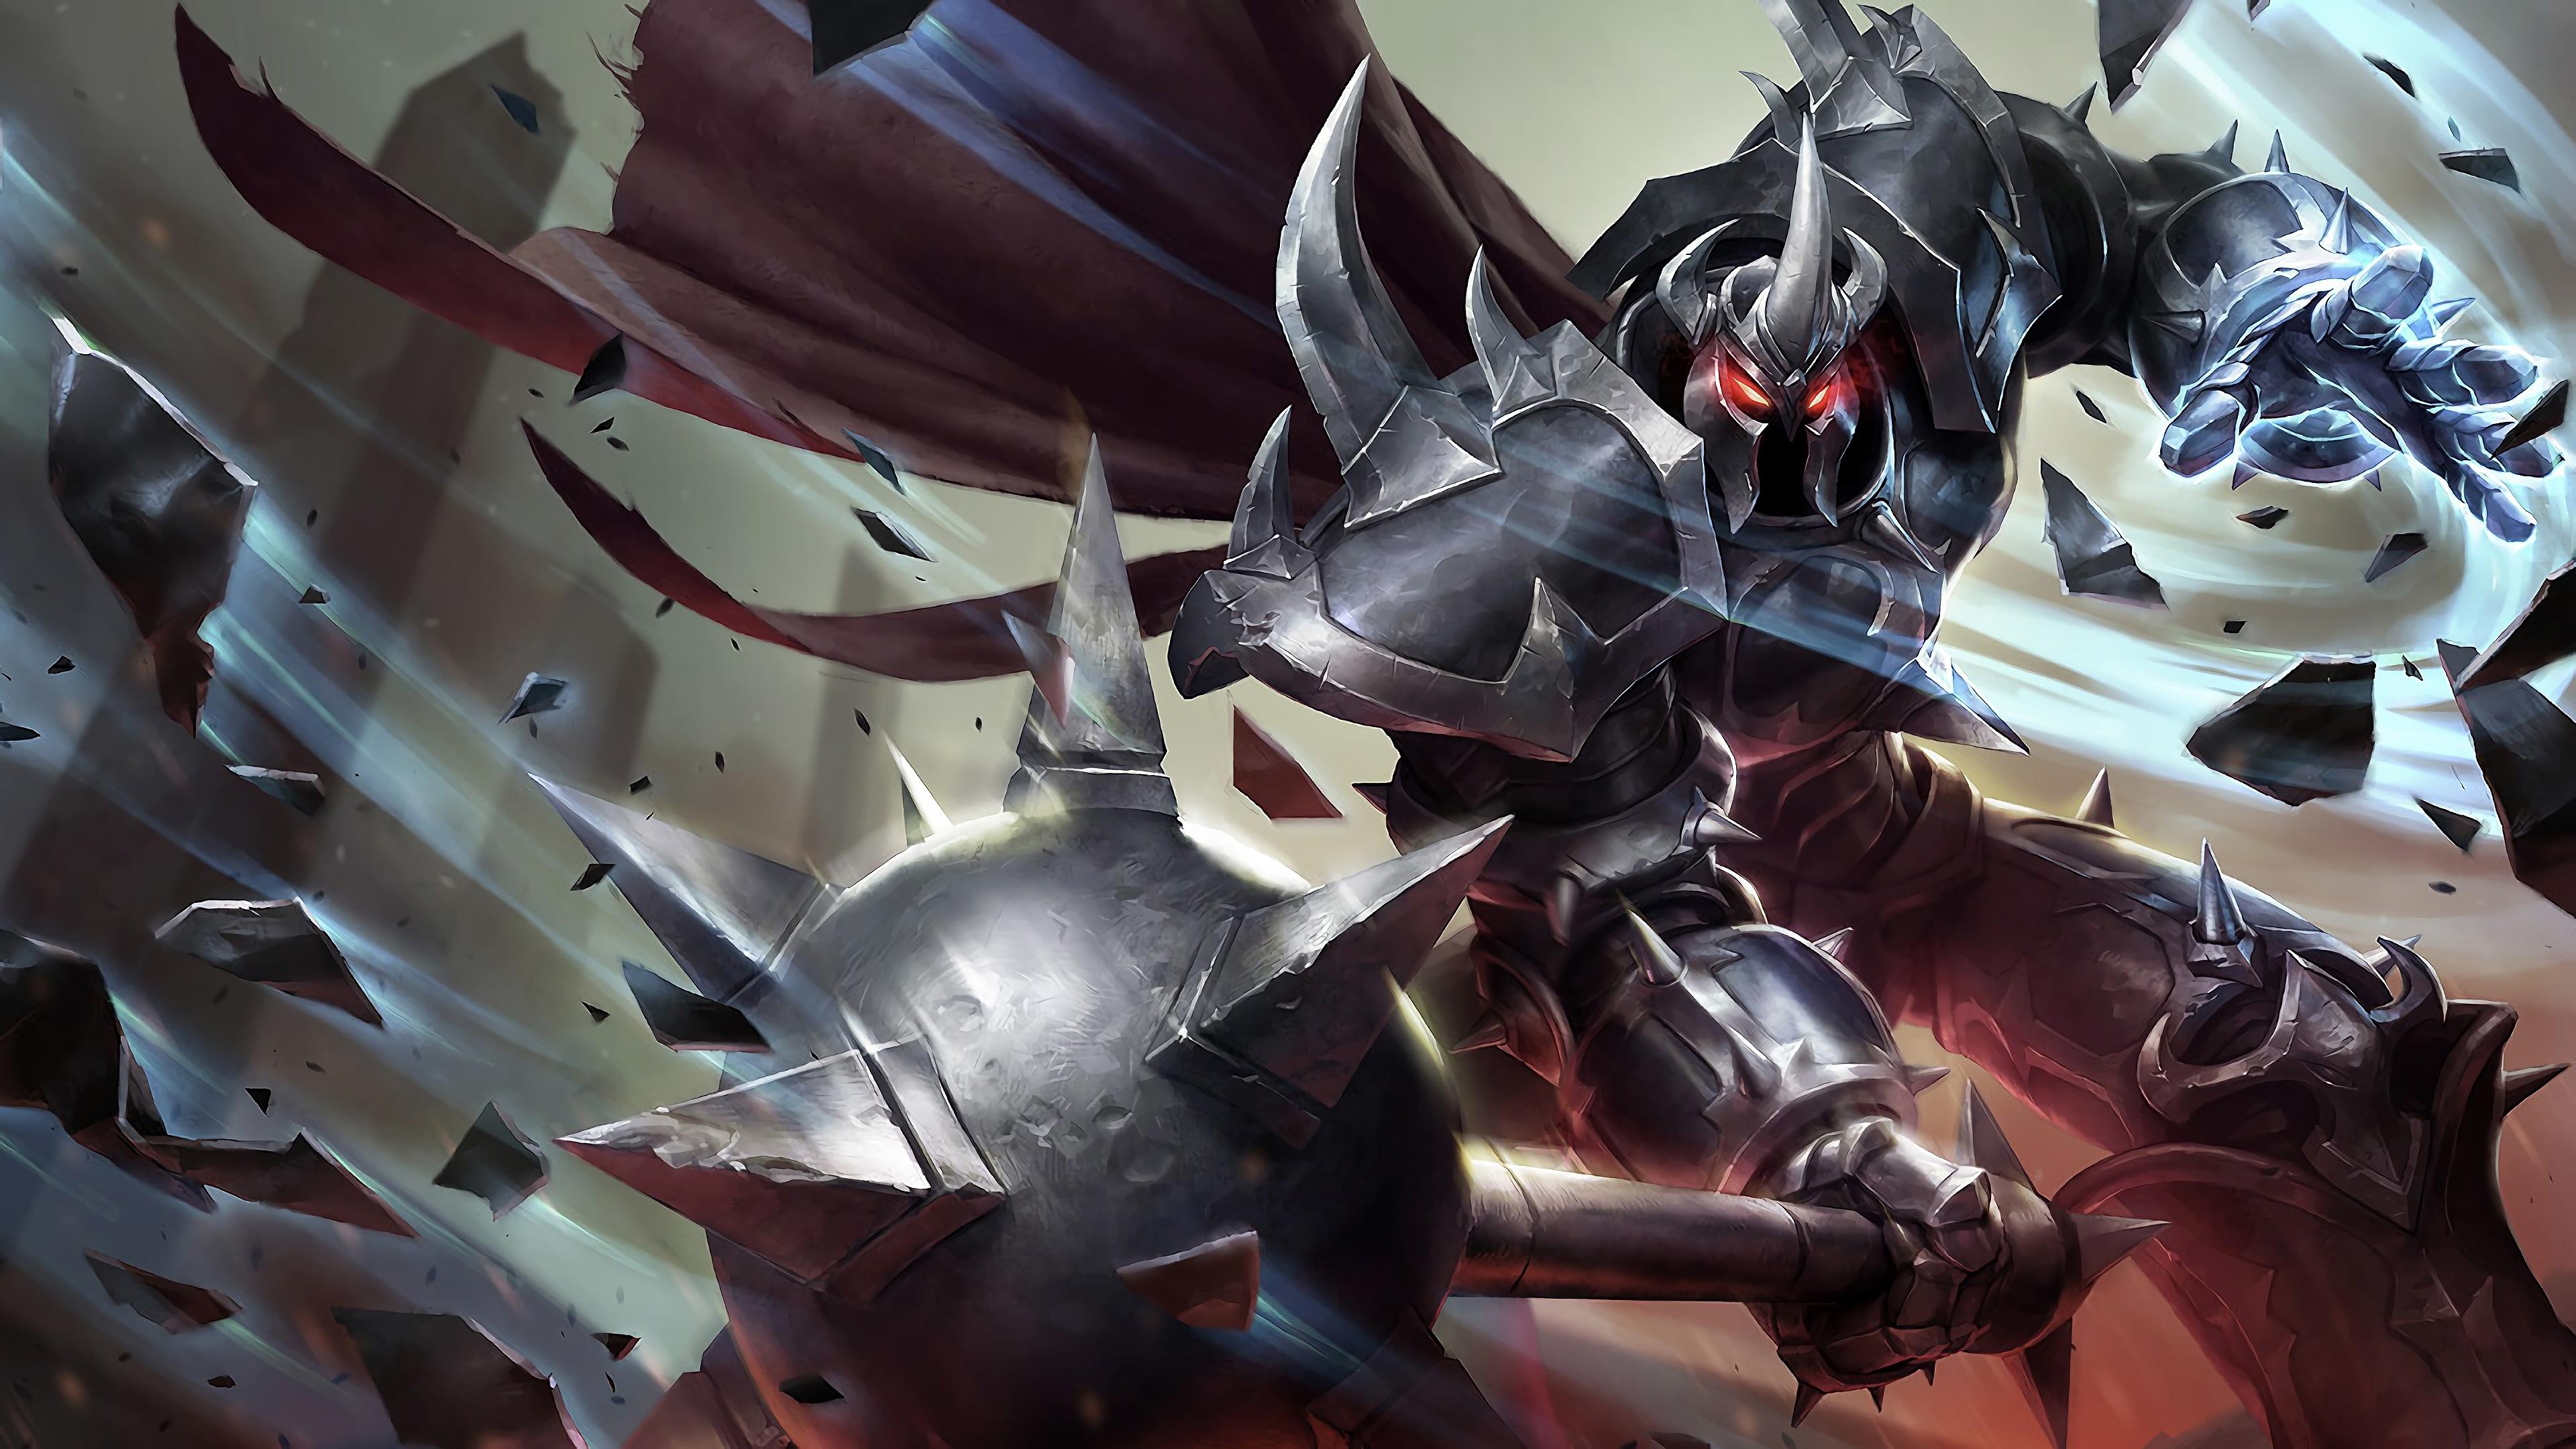 mordekaiser lol splash art league of legends 1574100771 - Mordekaiser LoL Splash Art League of Legends - Mordekaiser, league of legends